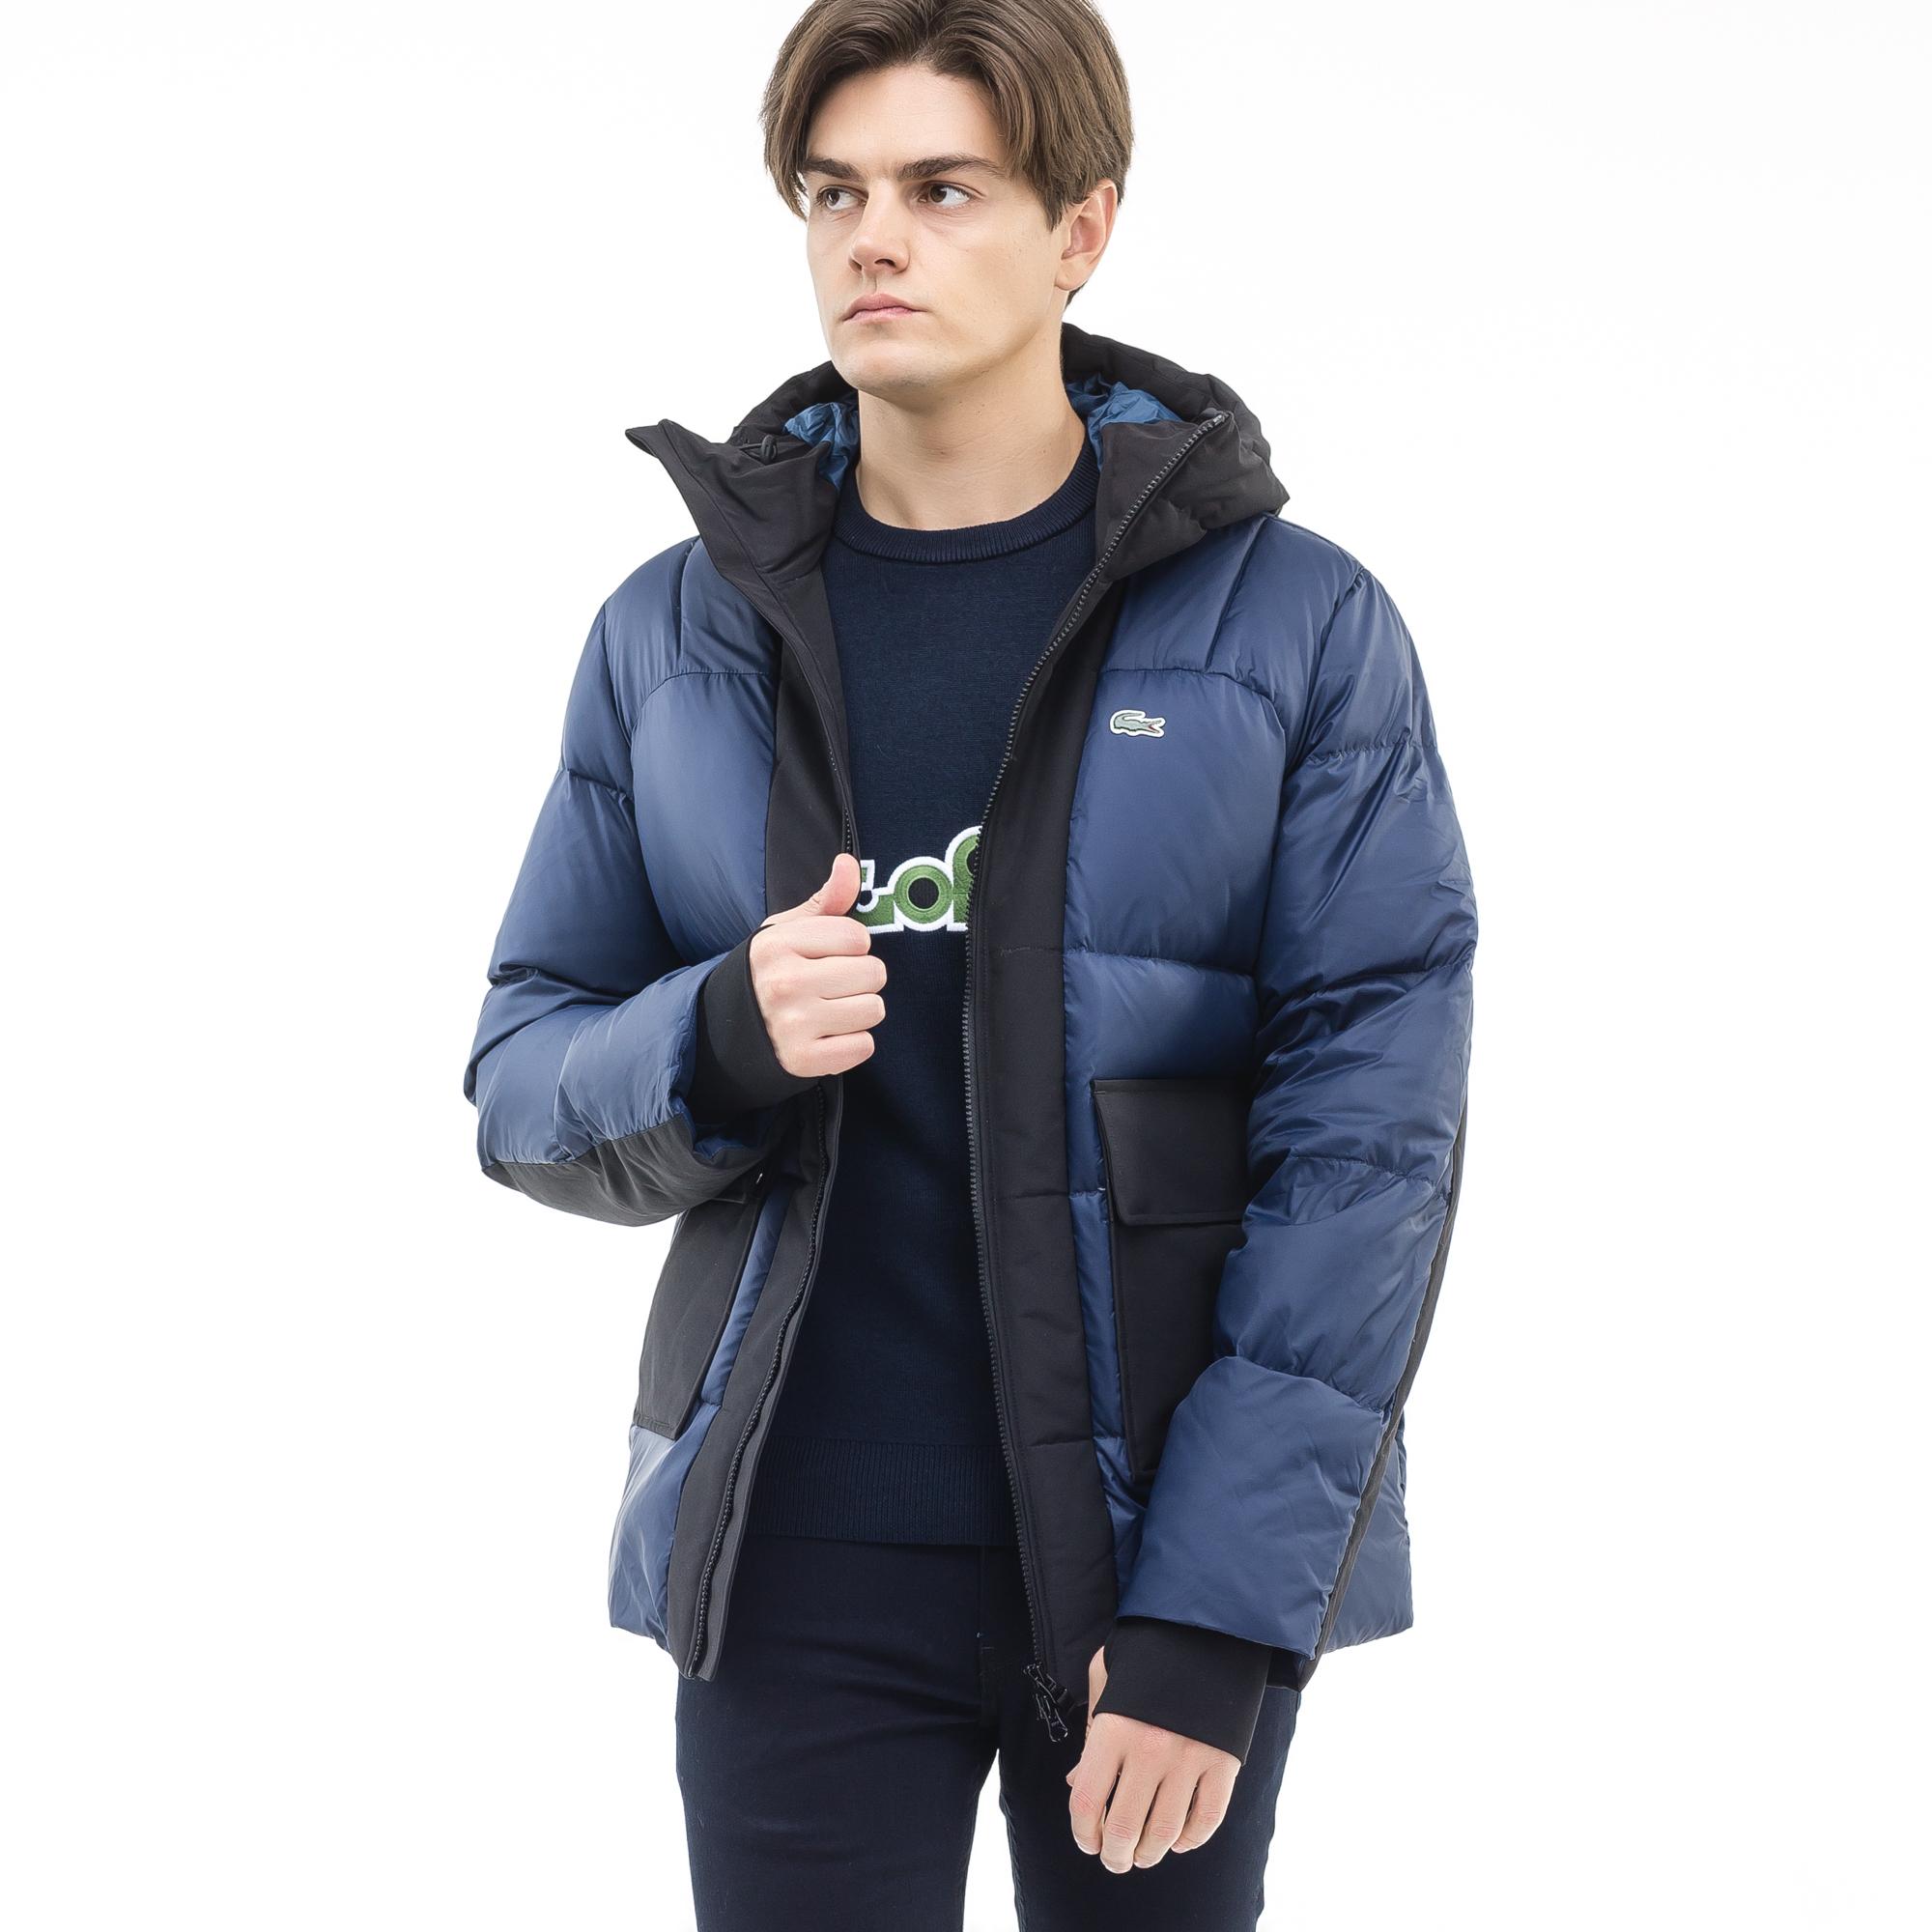 Куртка LacosteВерхняя одежда<br>100%полиамид/67%вискоза29%полиамид 4%эластан/100%полиэстер/70%пух 30%перо